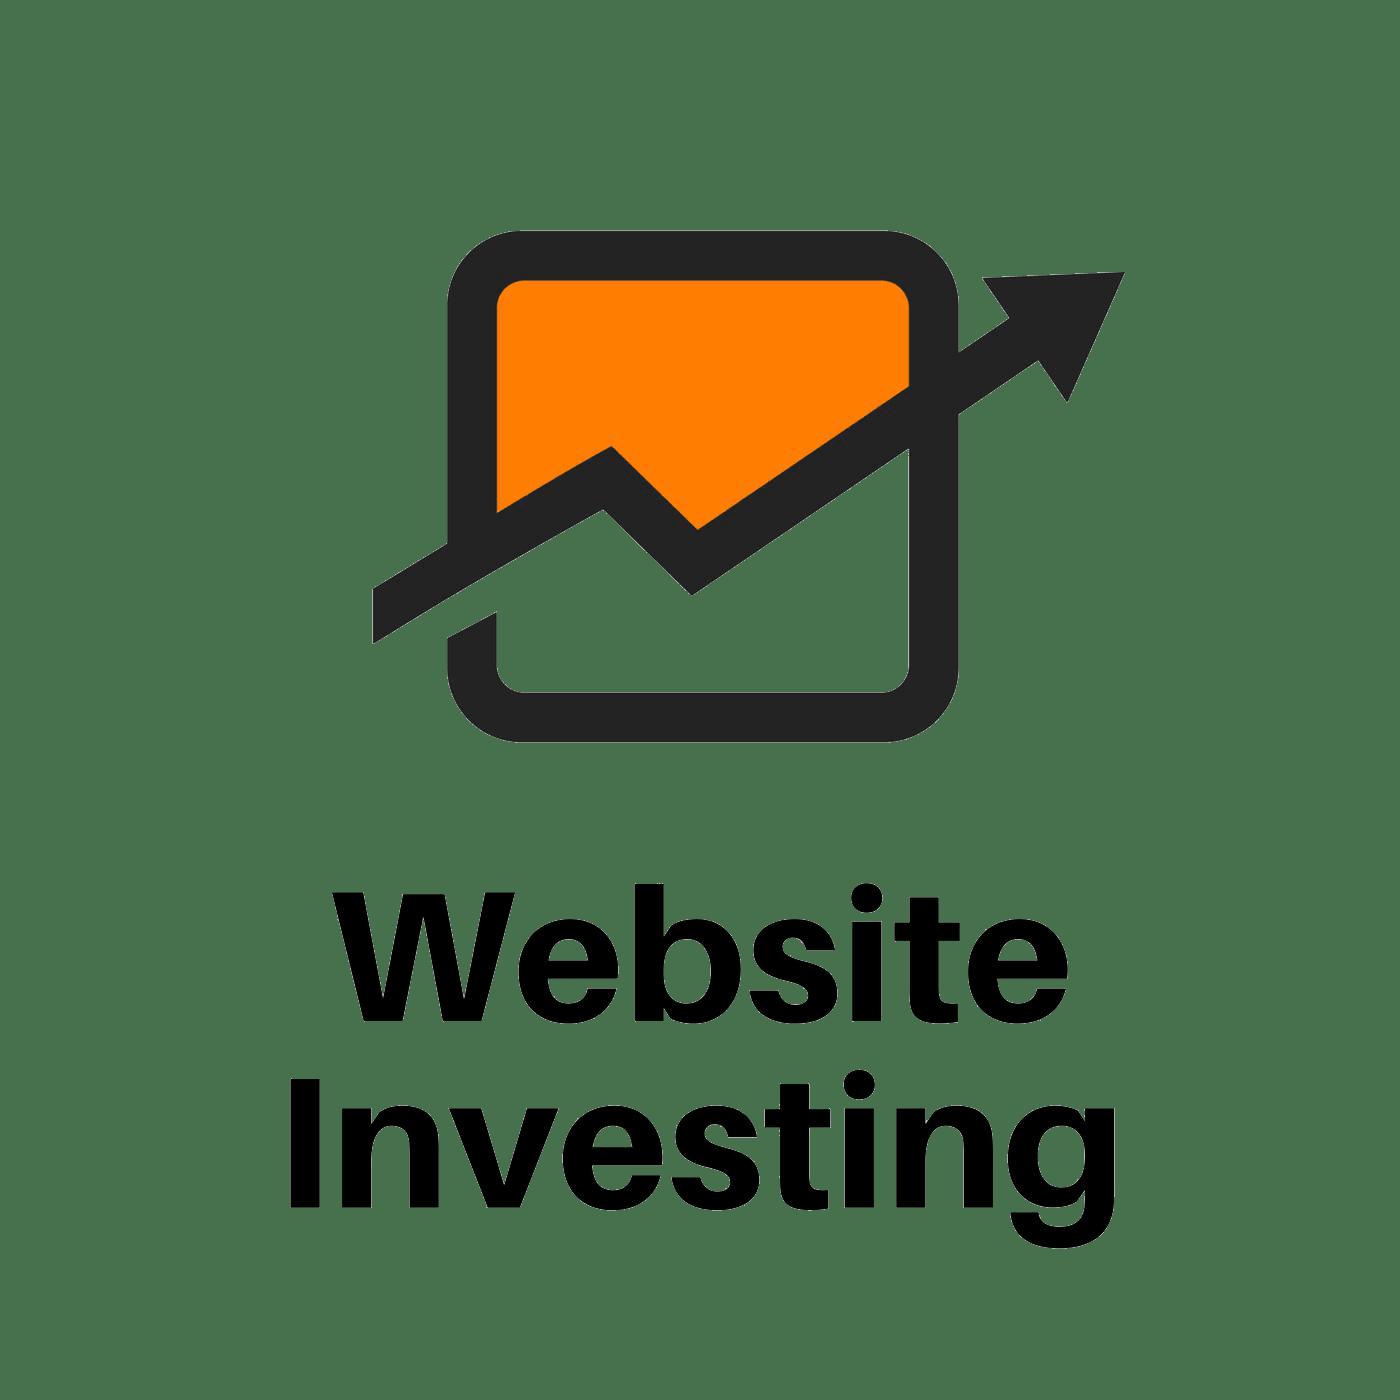 website investing podcast